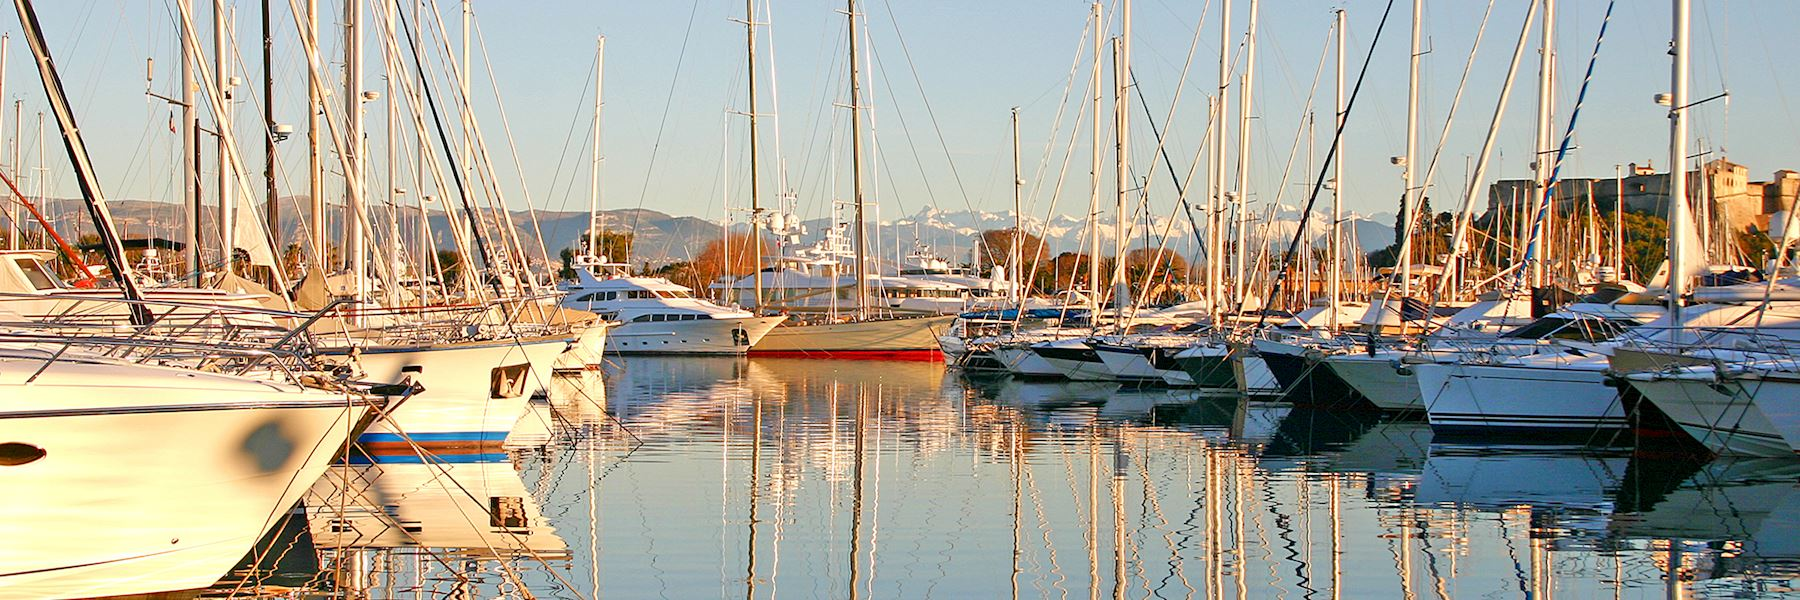 Visit Antibes, France